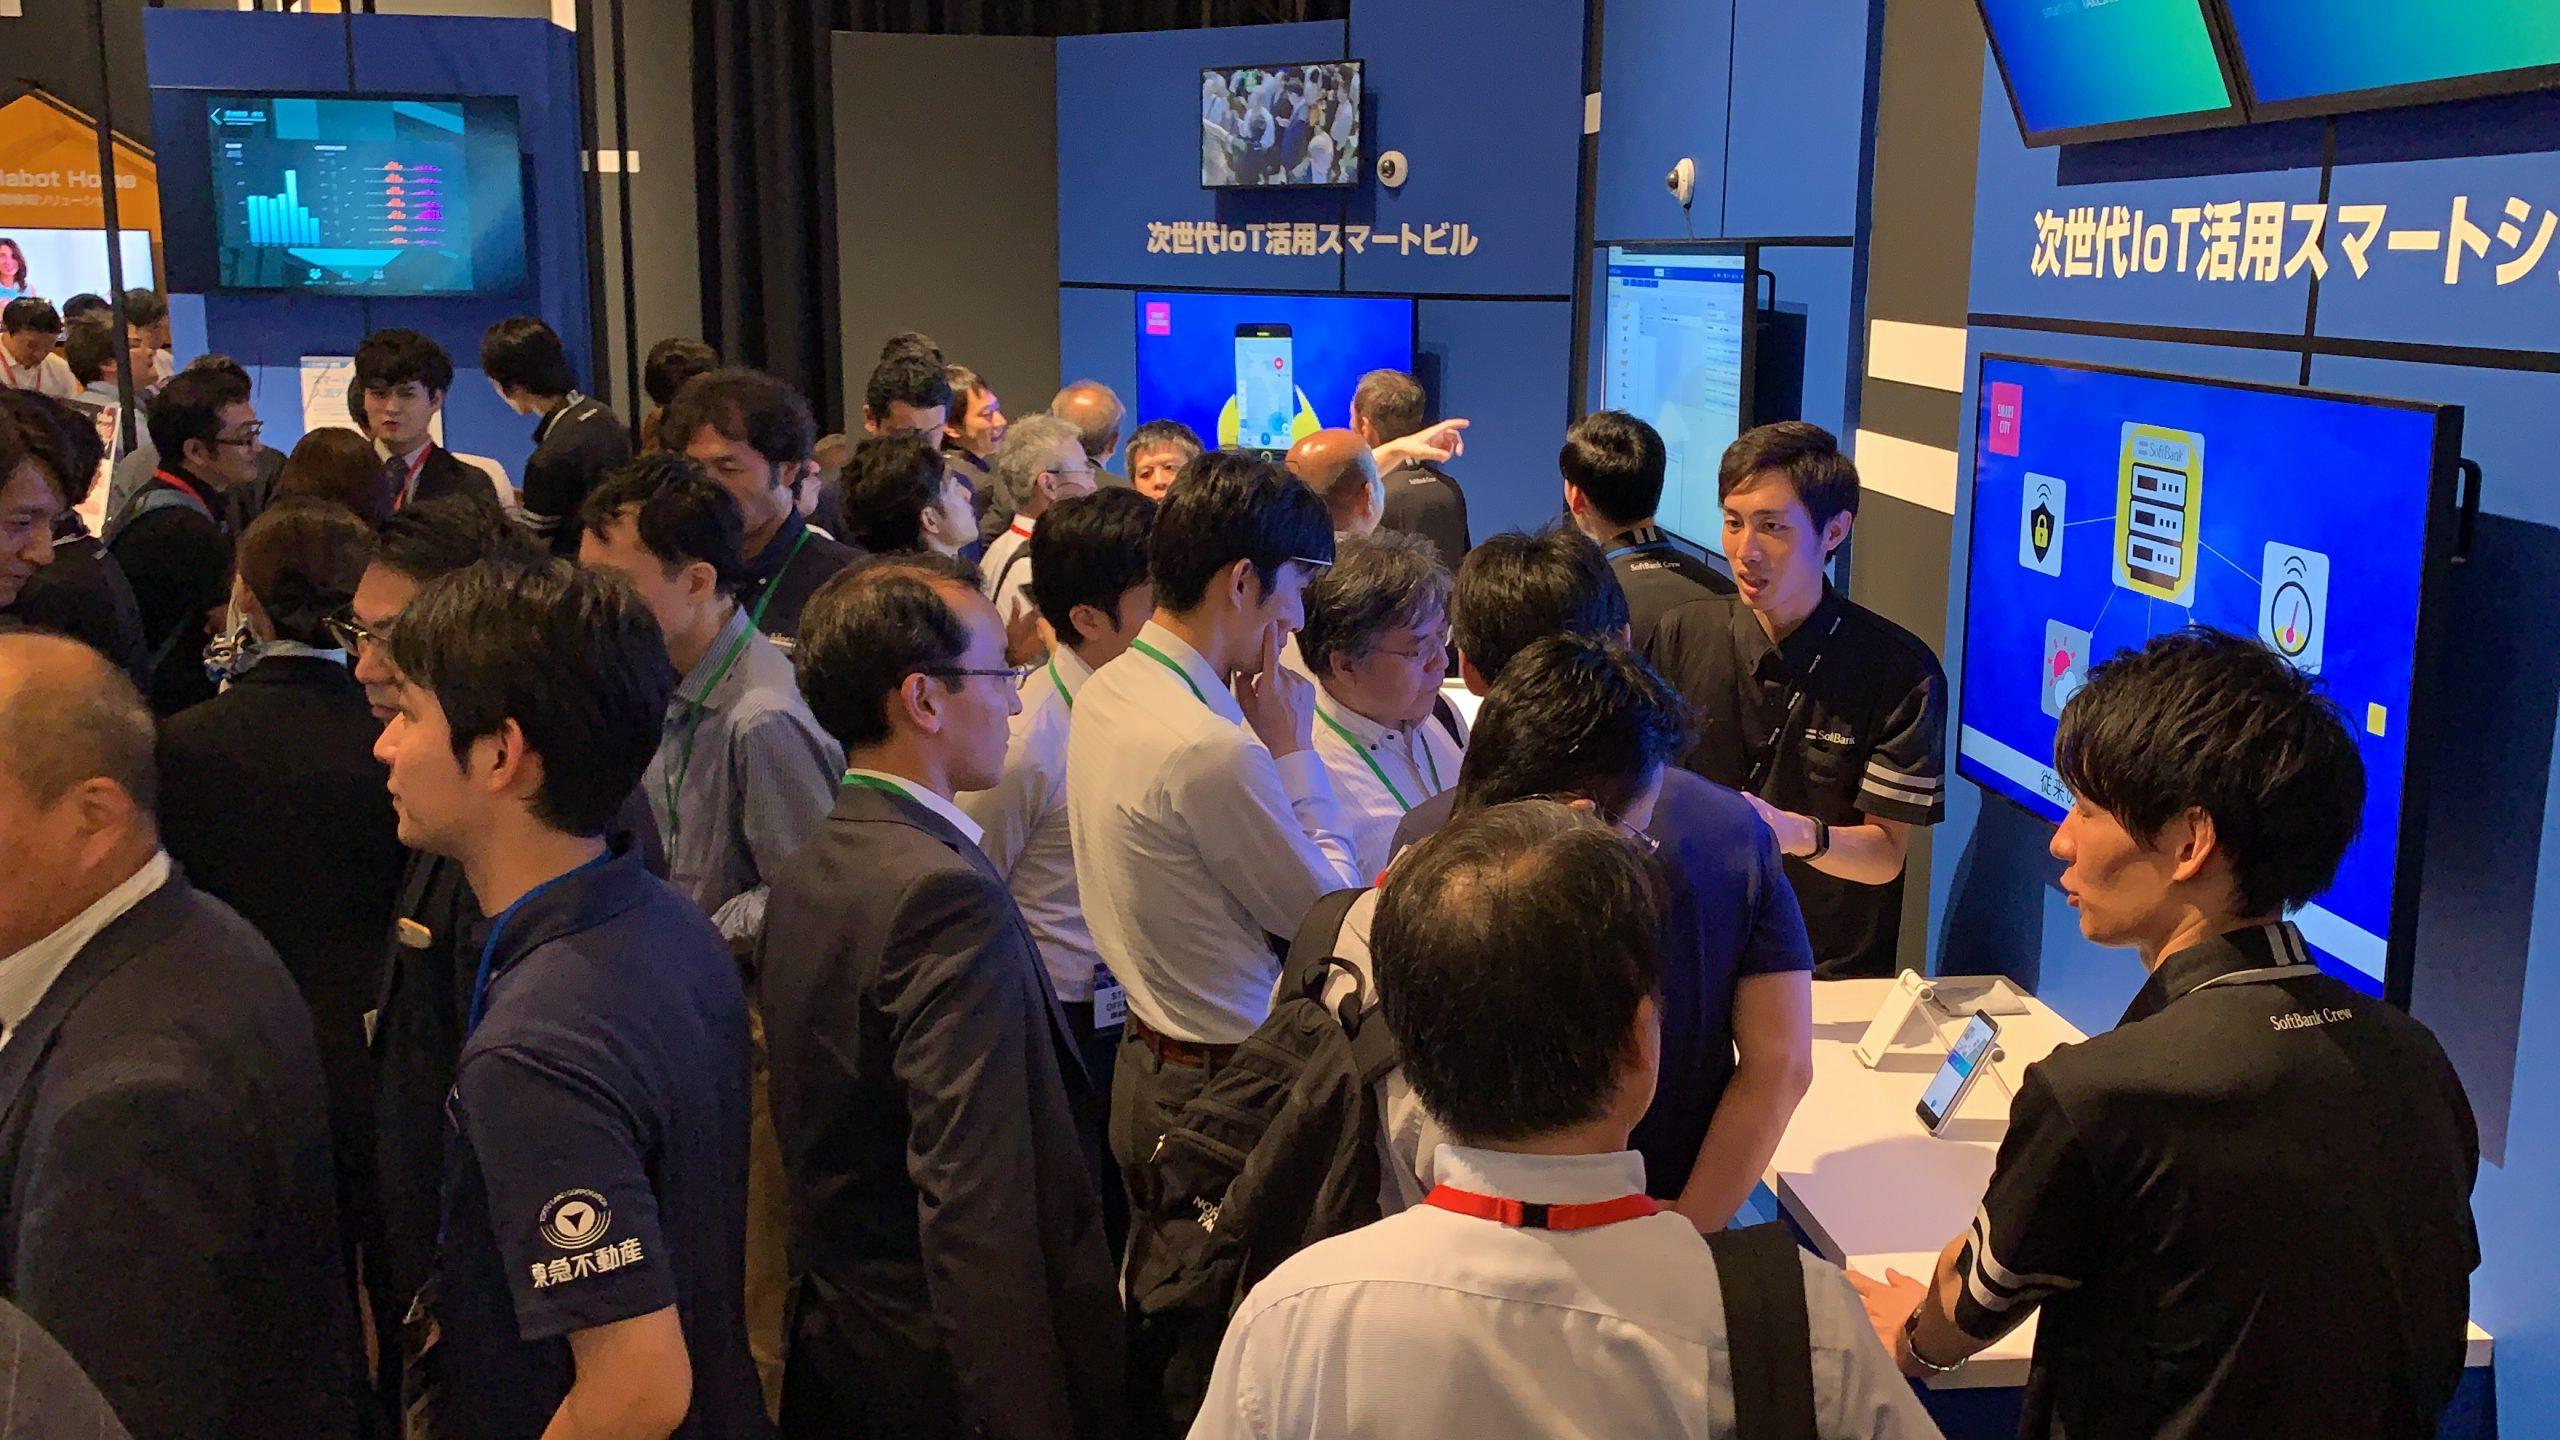 Packed VANTIQ booth at SoftBank World 2019